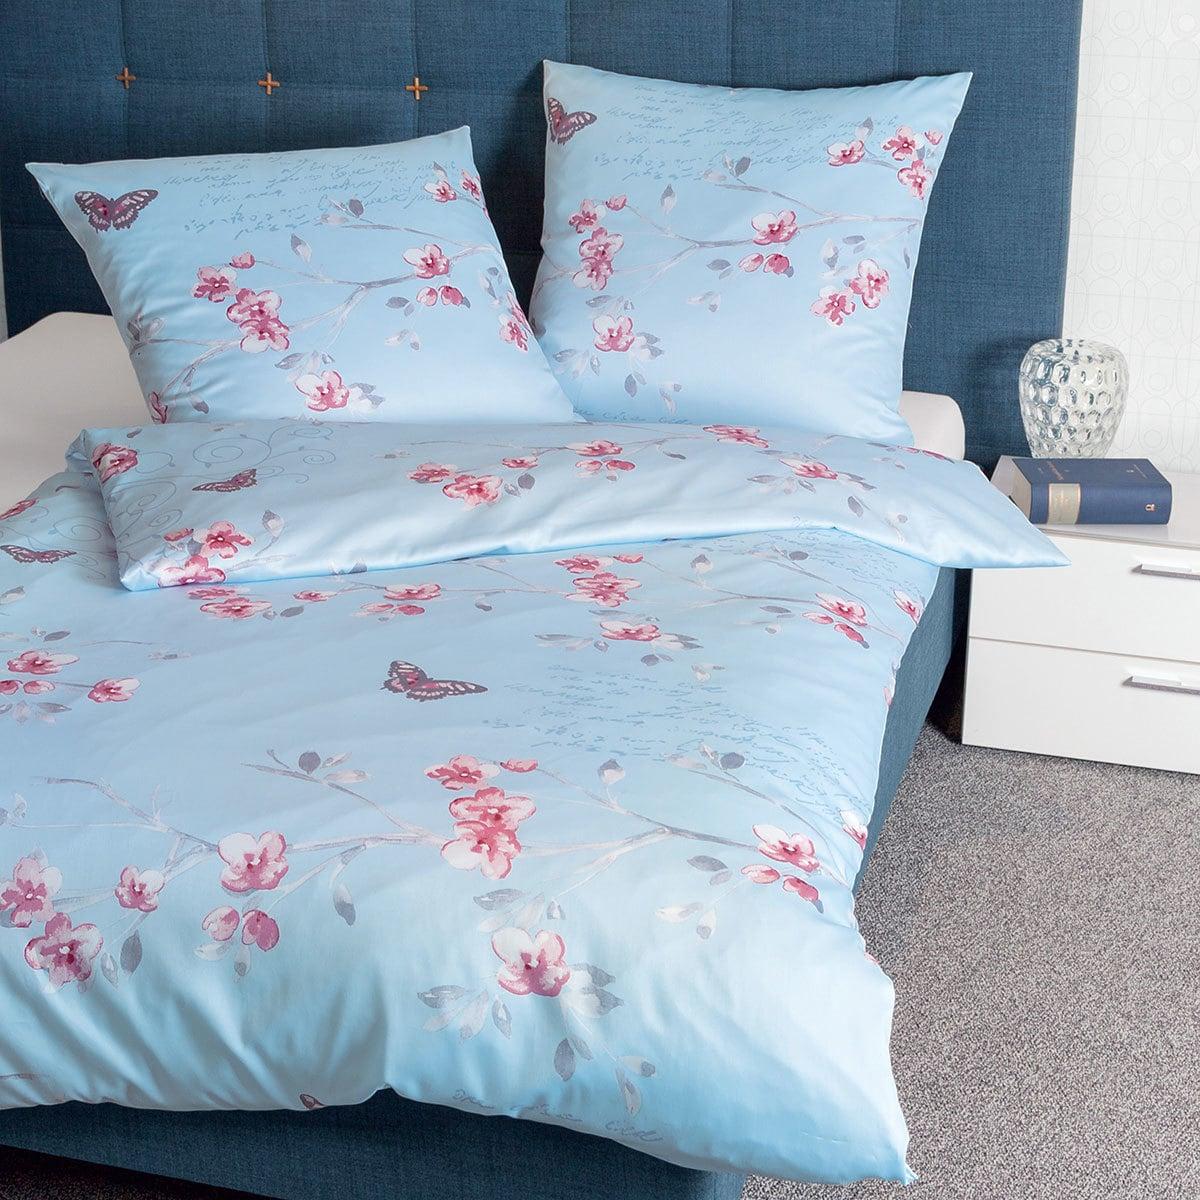 janine mako satin bettw sche moments 98028 02 g nstig online kaufen bei bettwaren shop. Black Bedroom Furniture Sets. Home Design Ideas